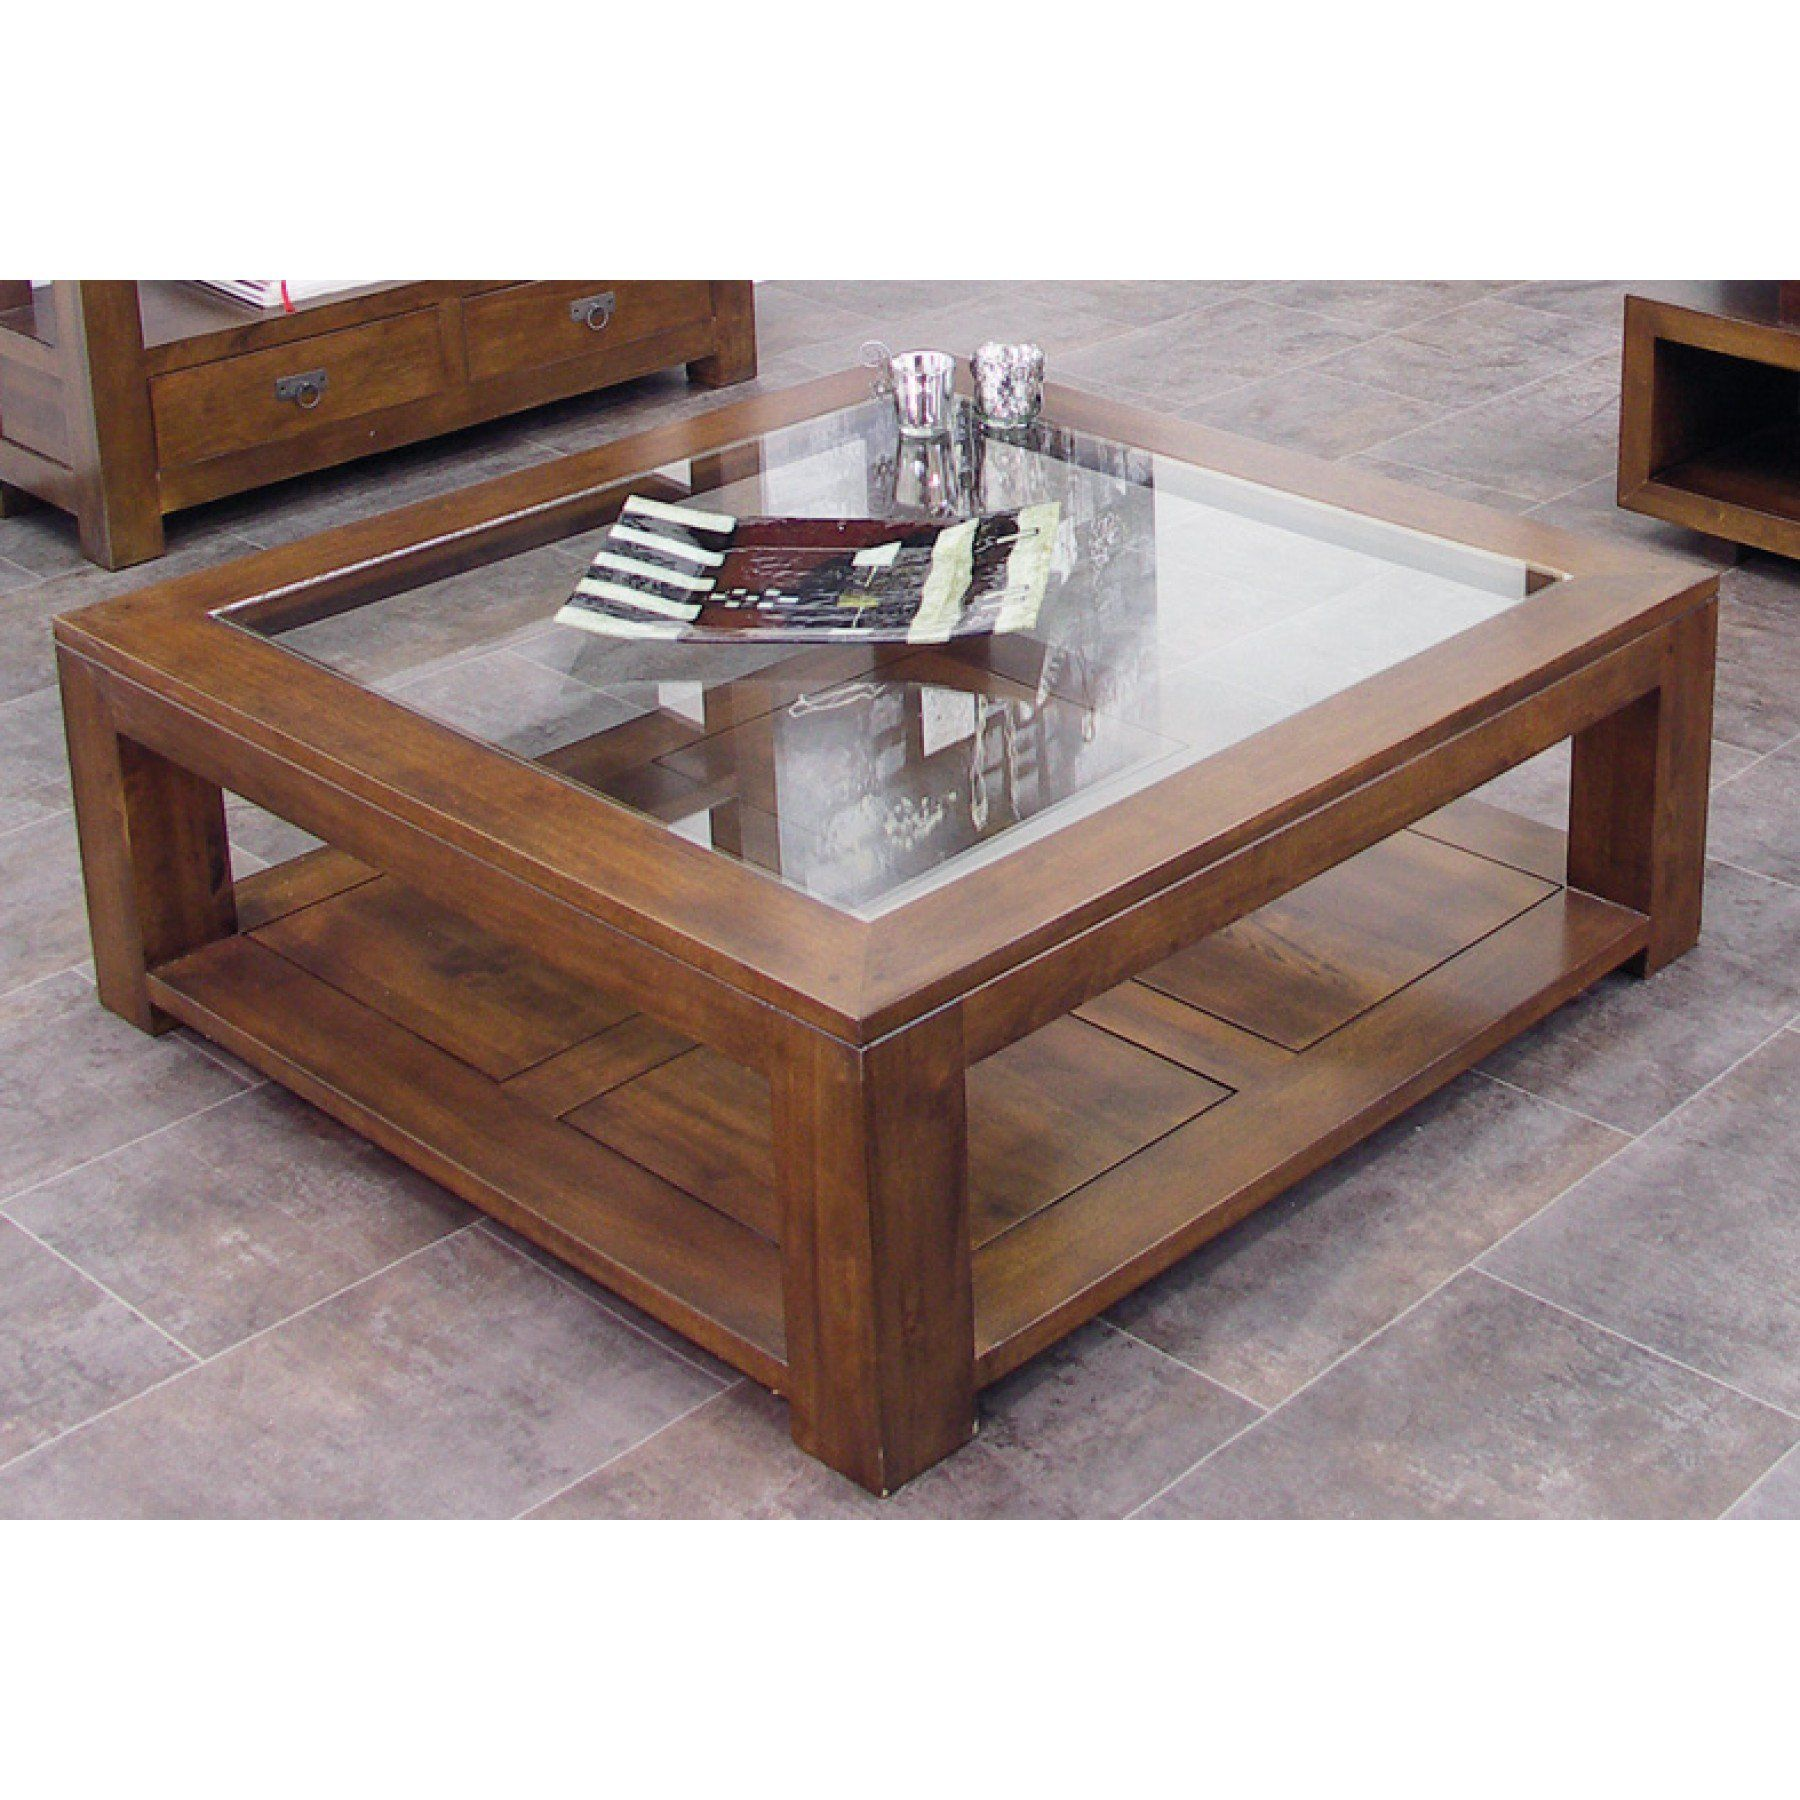 Table Basse Carree Vitree Grande Taille Maya Par Nomadde Meubles